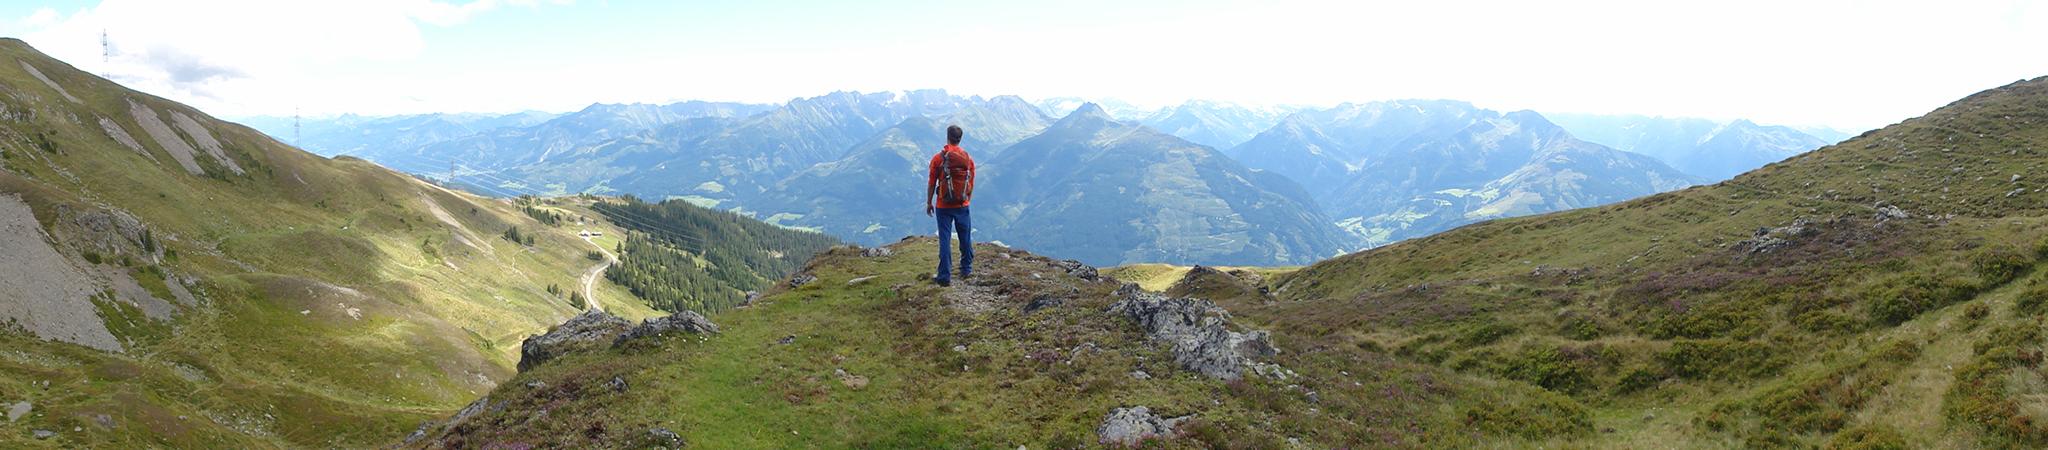 Arnoweg: Entlang des Pinzgauer Spaziergang lässt sich das grandiose Panorama des Alpenhauptkamms genießen.